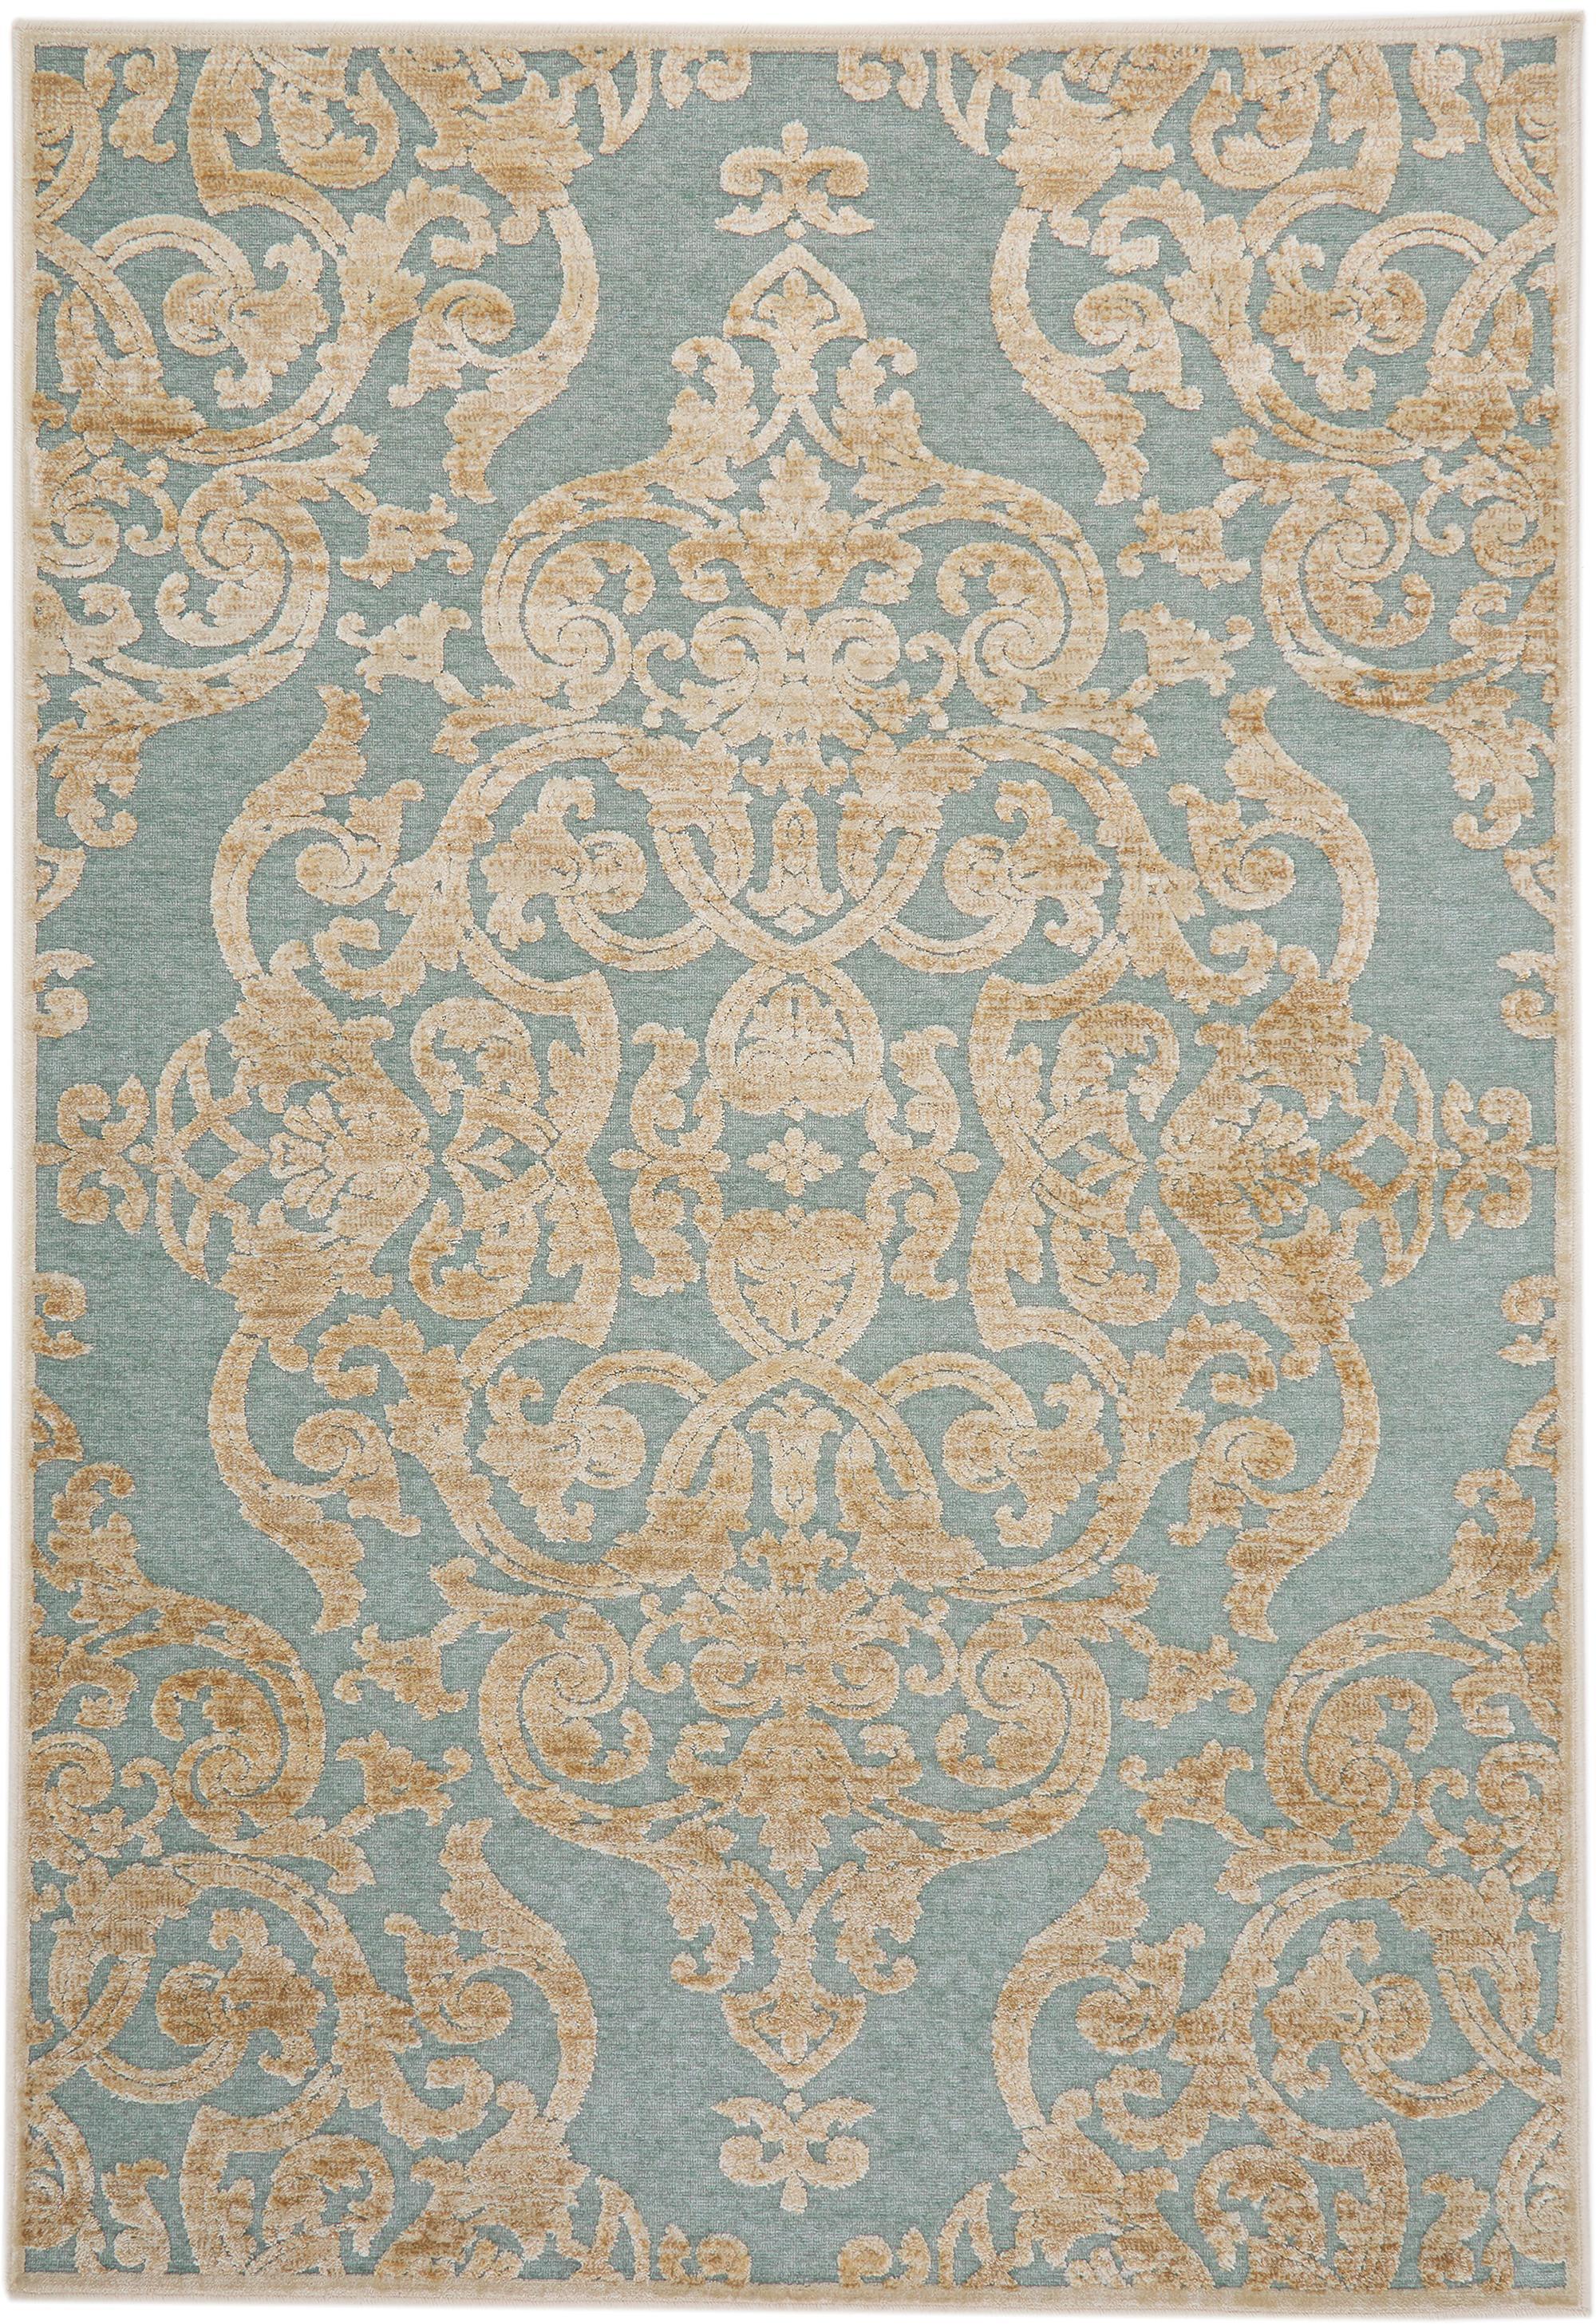 Alfombra Marigot, estilo vintage, Parte superior: 100%viscosa, Reverso: 100%viscosa, Azul claro, crema, An 120 x L 170 cm (Tamaño S)